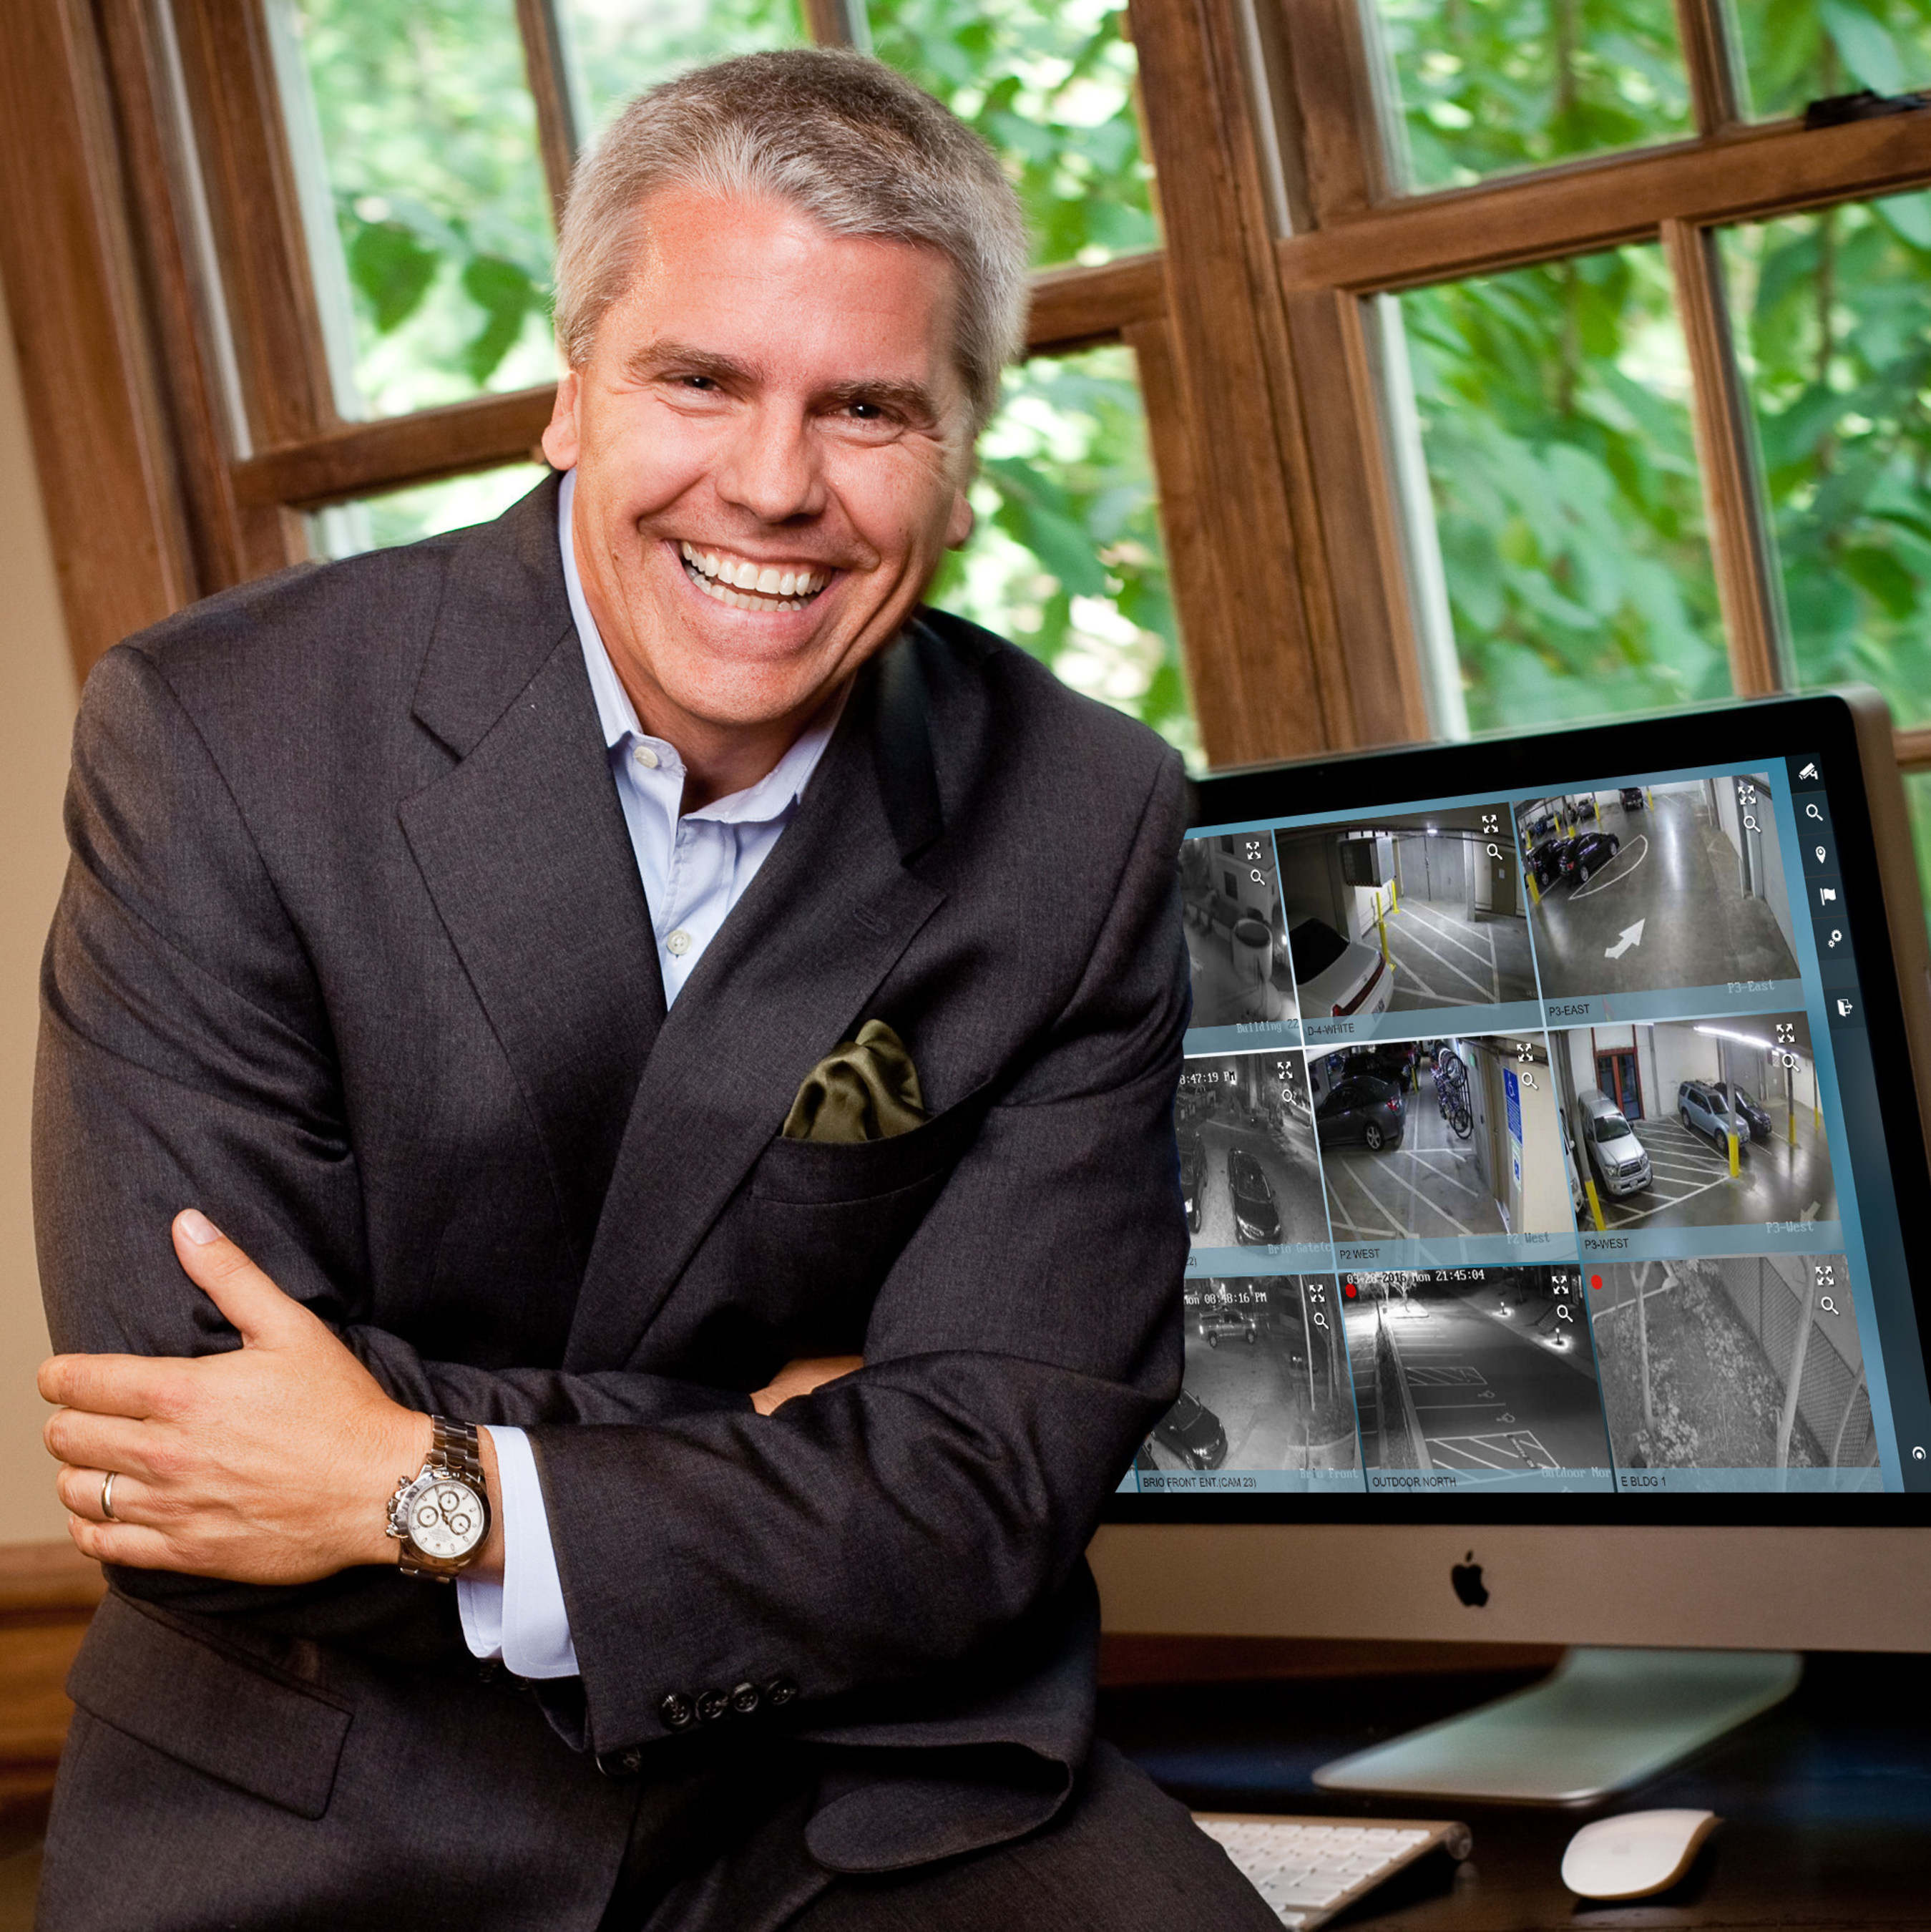 Martin Renkis, Founder + CEO Smartvue Corporation